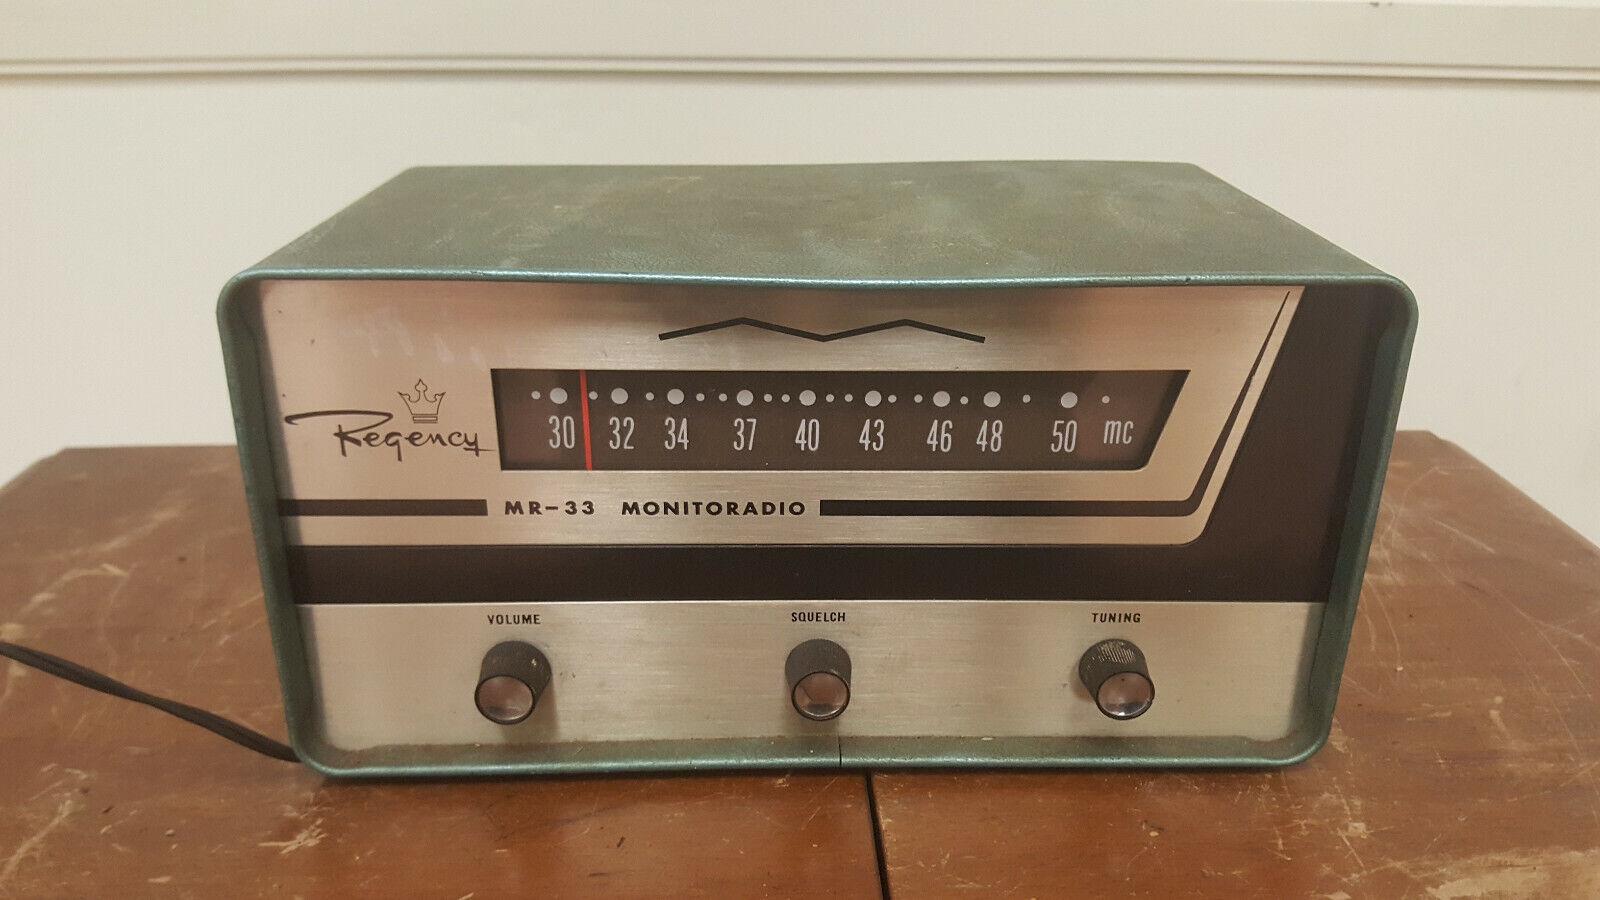 VHF-Low Band Regency MR-33 Monitoradio